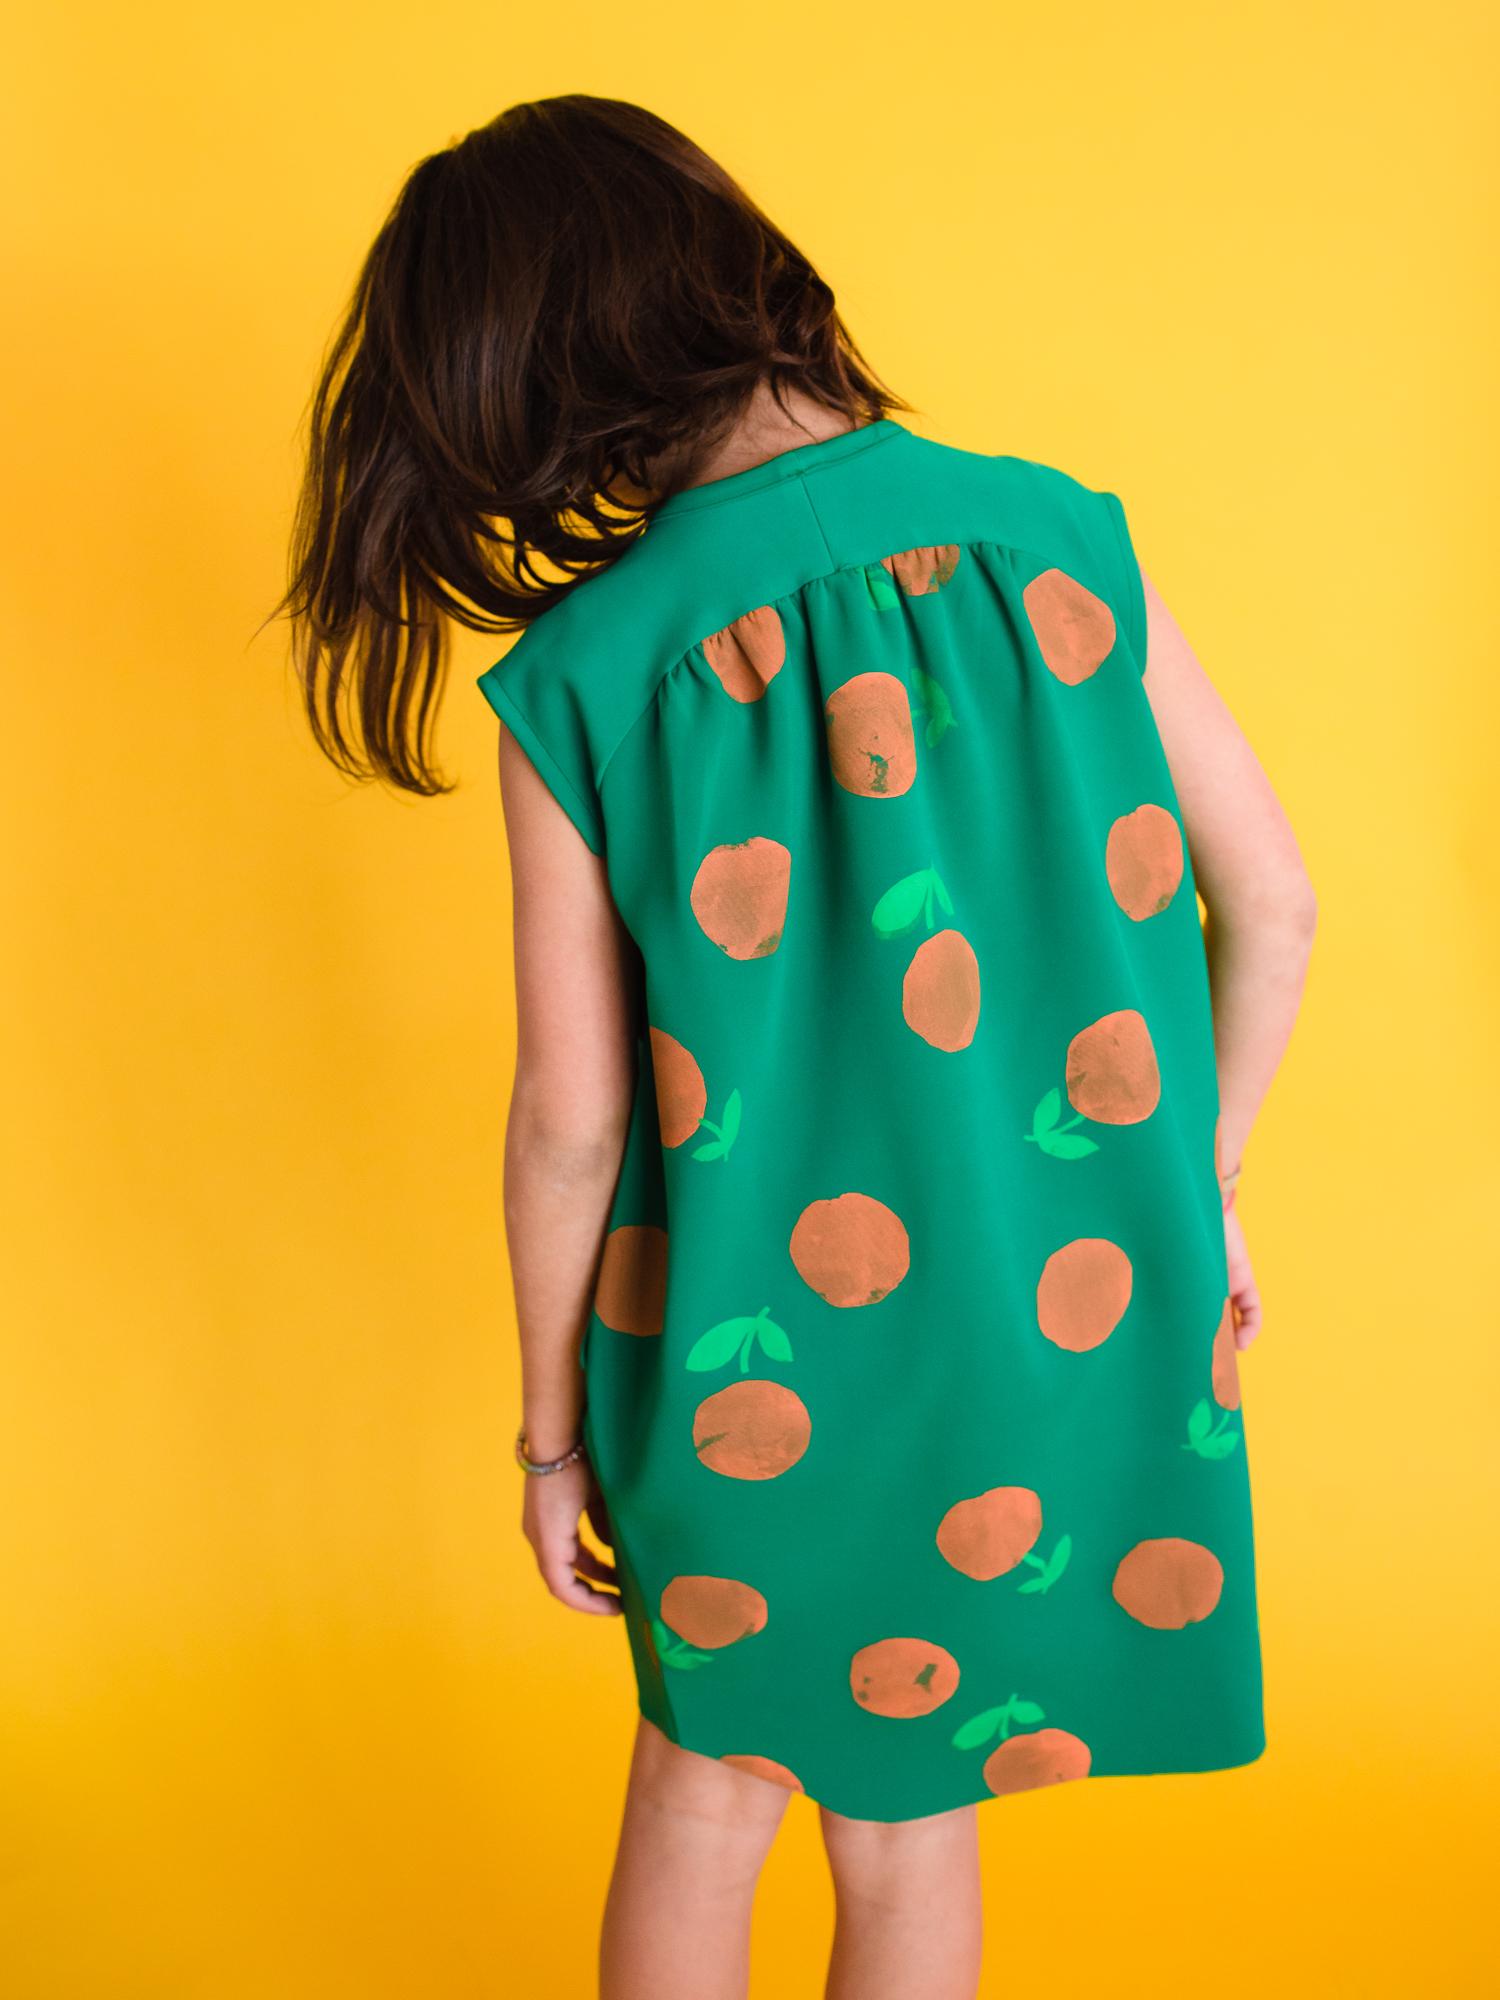 prp-kids-sewing-patterns10.jpg